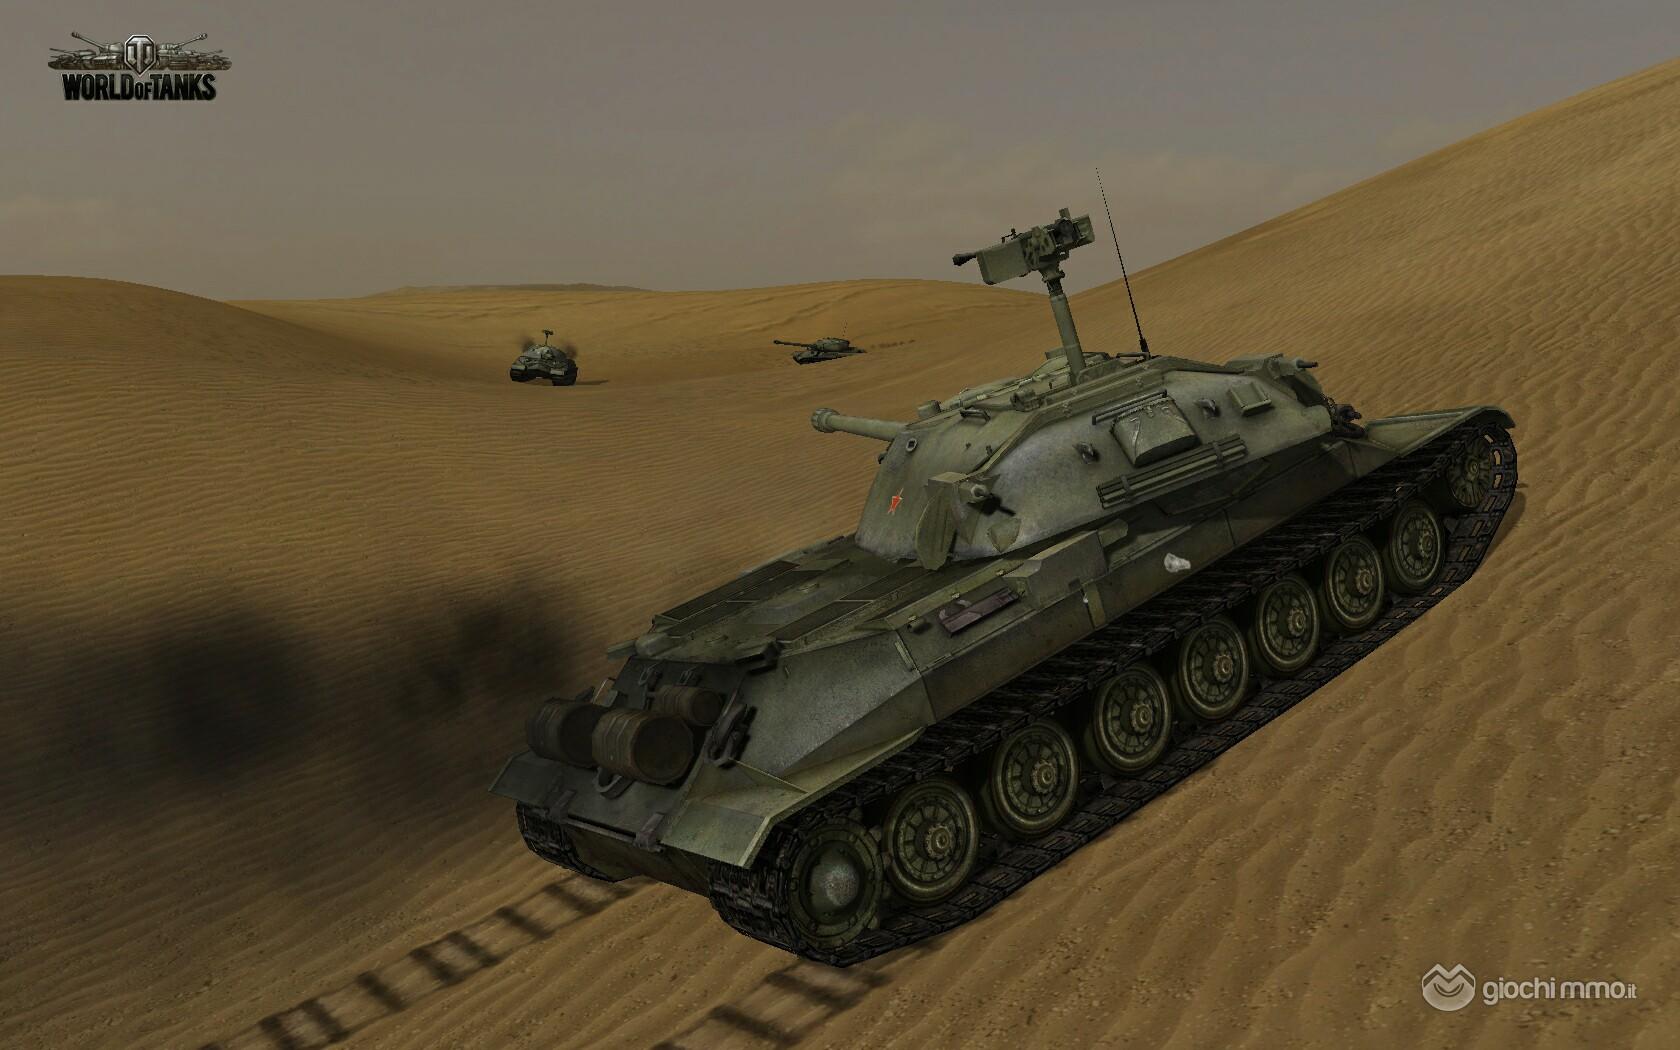 Clicca sull'immagine per ingrandirlaNome:   World of Tanks screen6.jpgVisite: 85Dimensione:   308.0 KBID: 8207